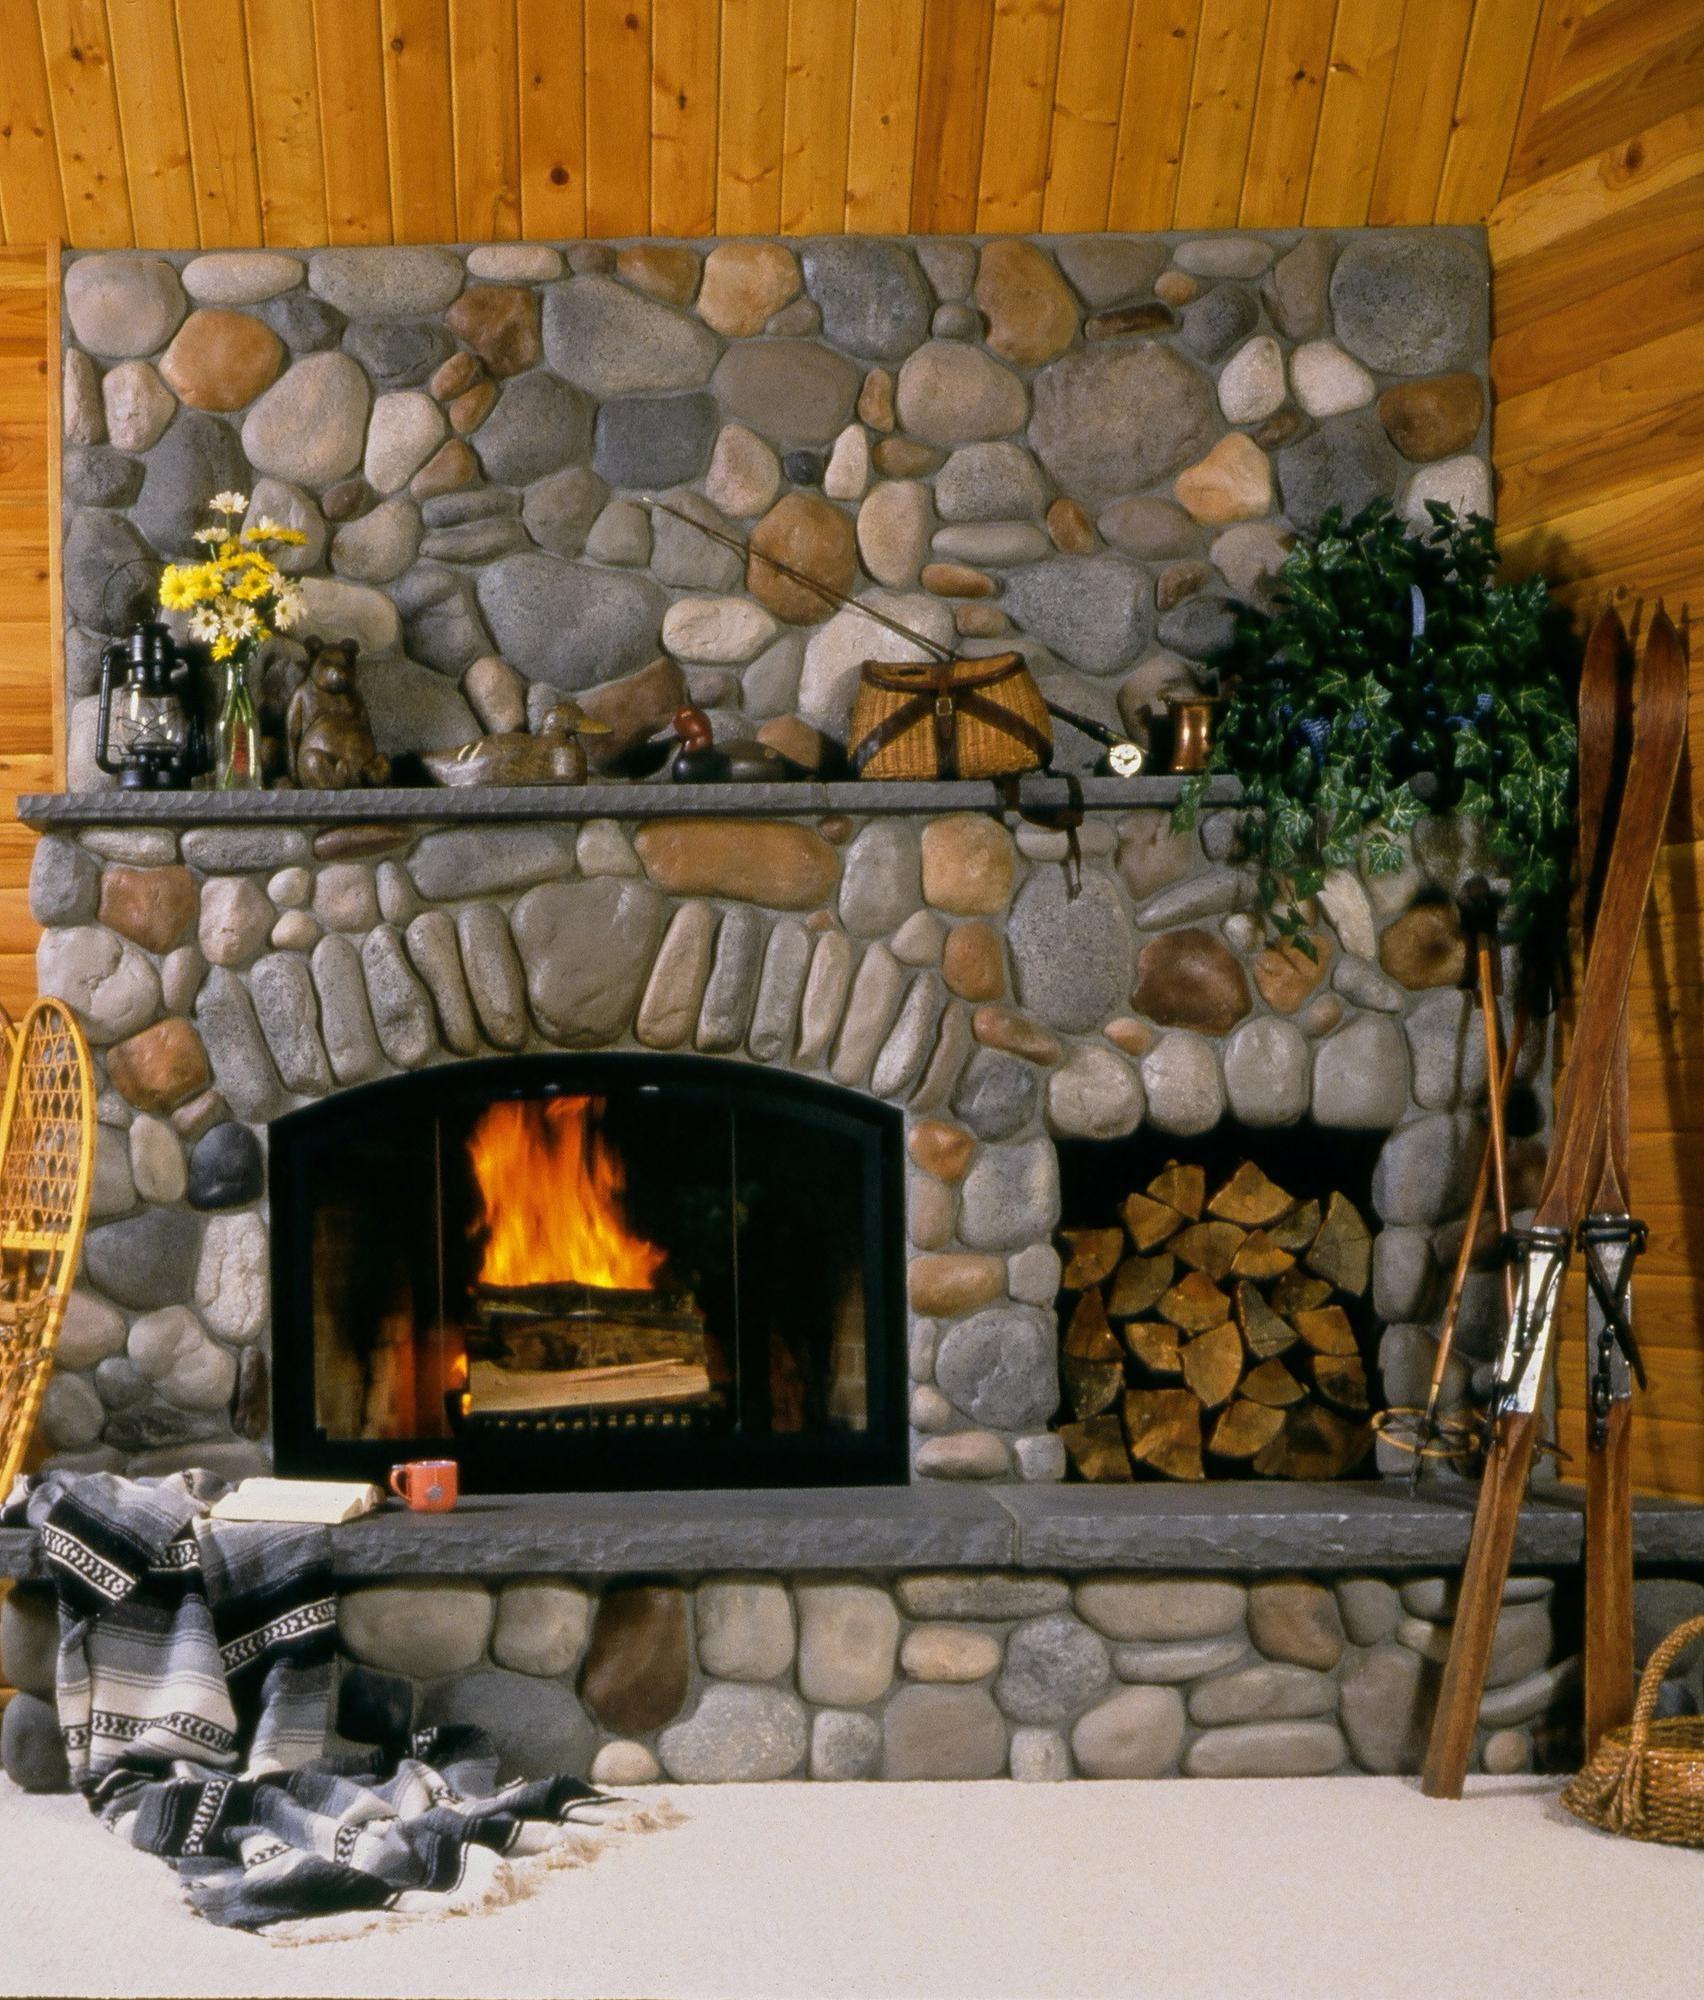 Eldorado Stone Imagine Inspiration Gallery Residential Fireplaces Stone Fireplace Stone Fireplace Designs River Rock Fireplaces